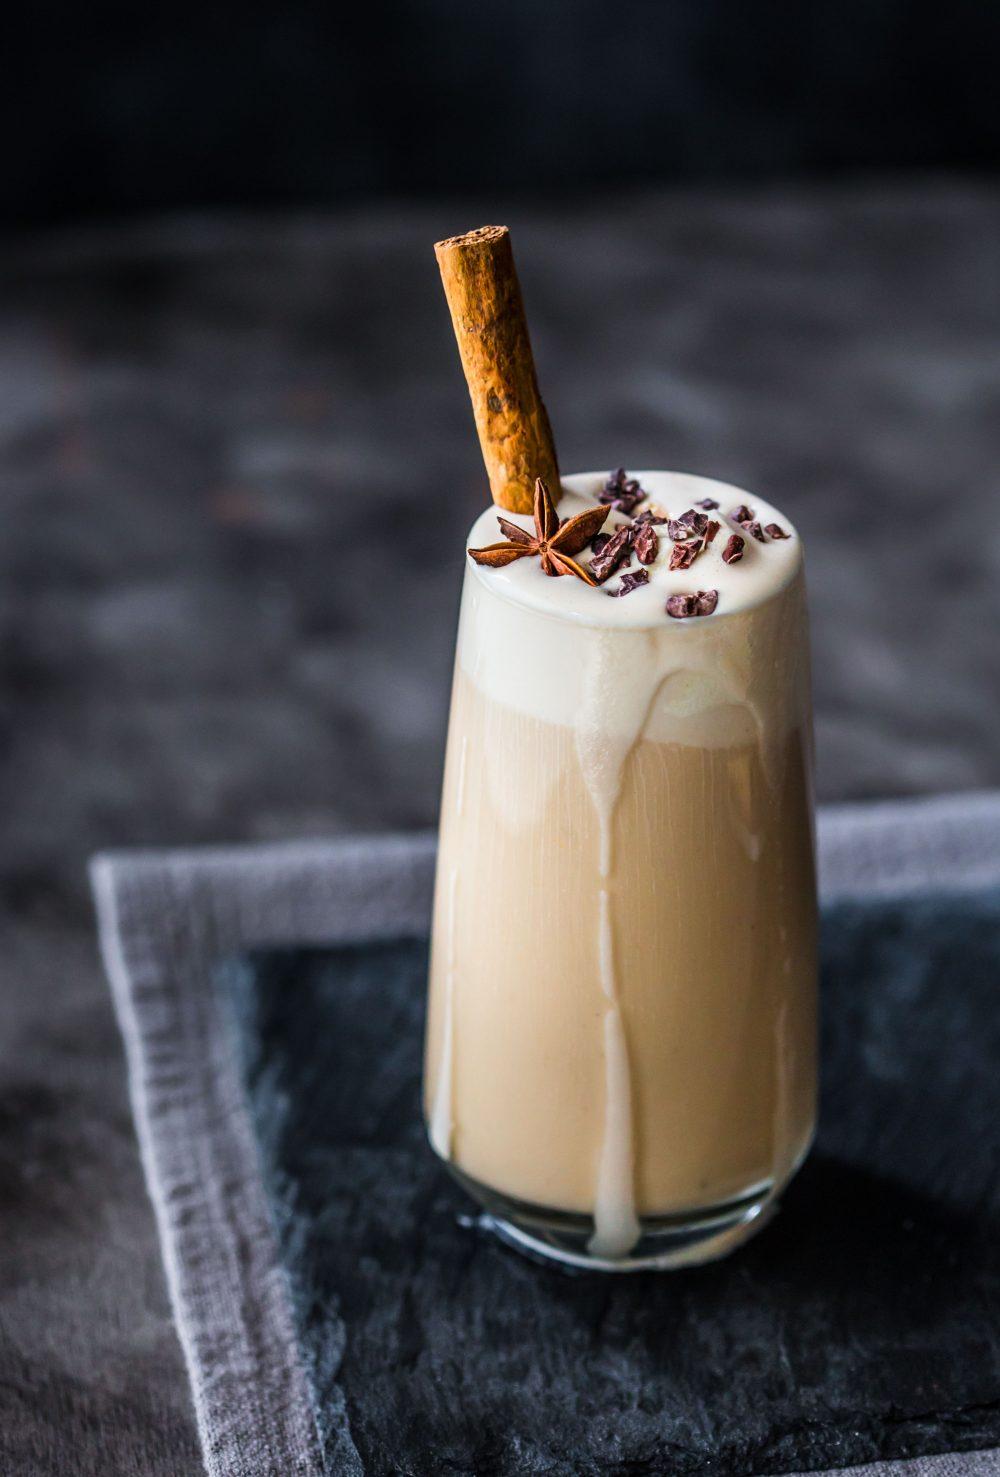 chai-latte-milkshake-dairy-free-vegan-refreshing-summer-easy-kids-family-shakes-chai-delicious